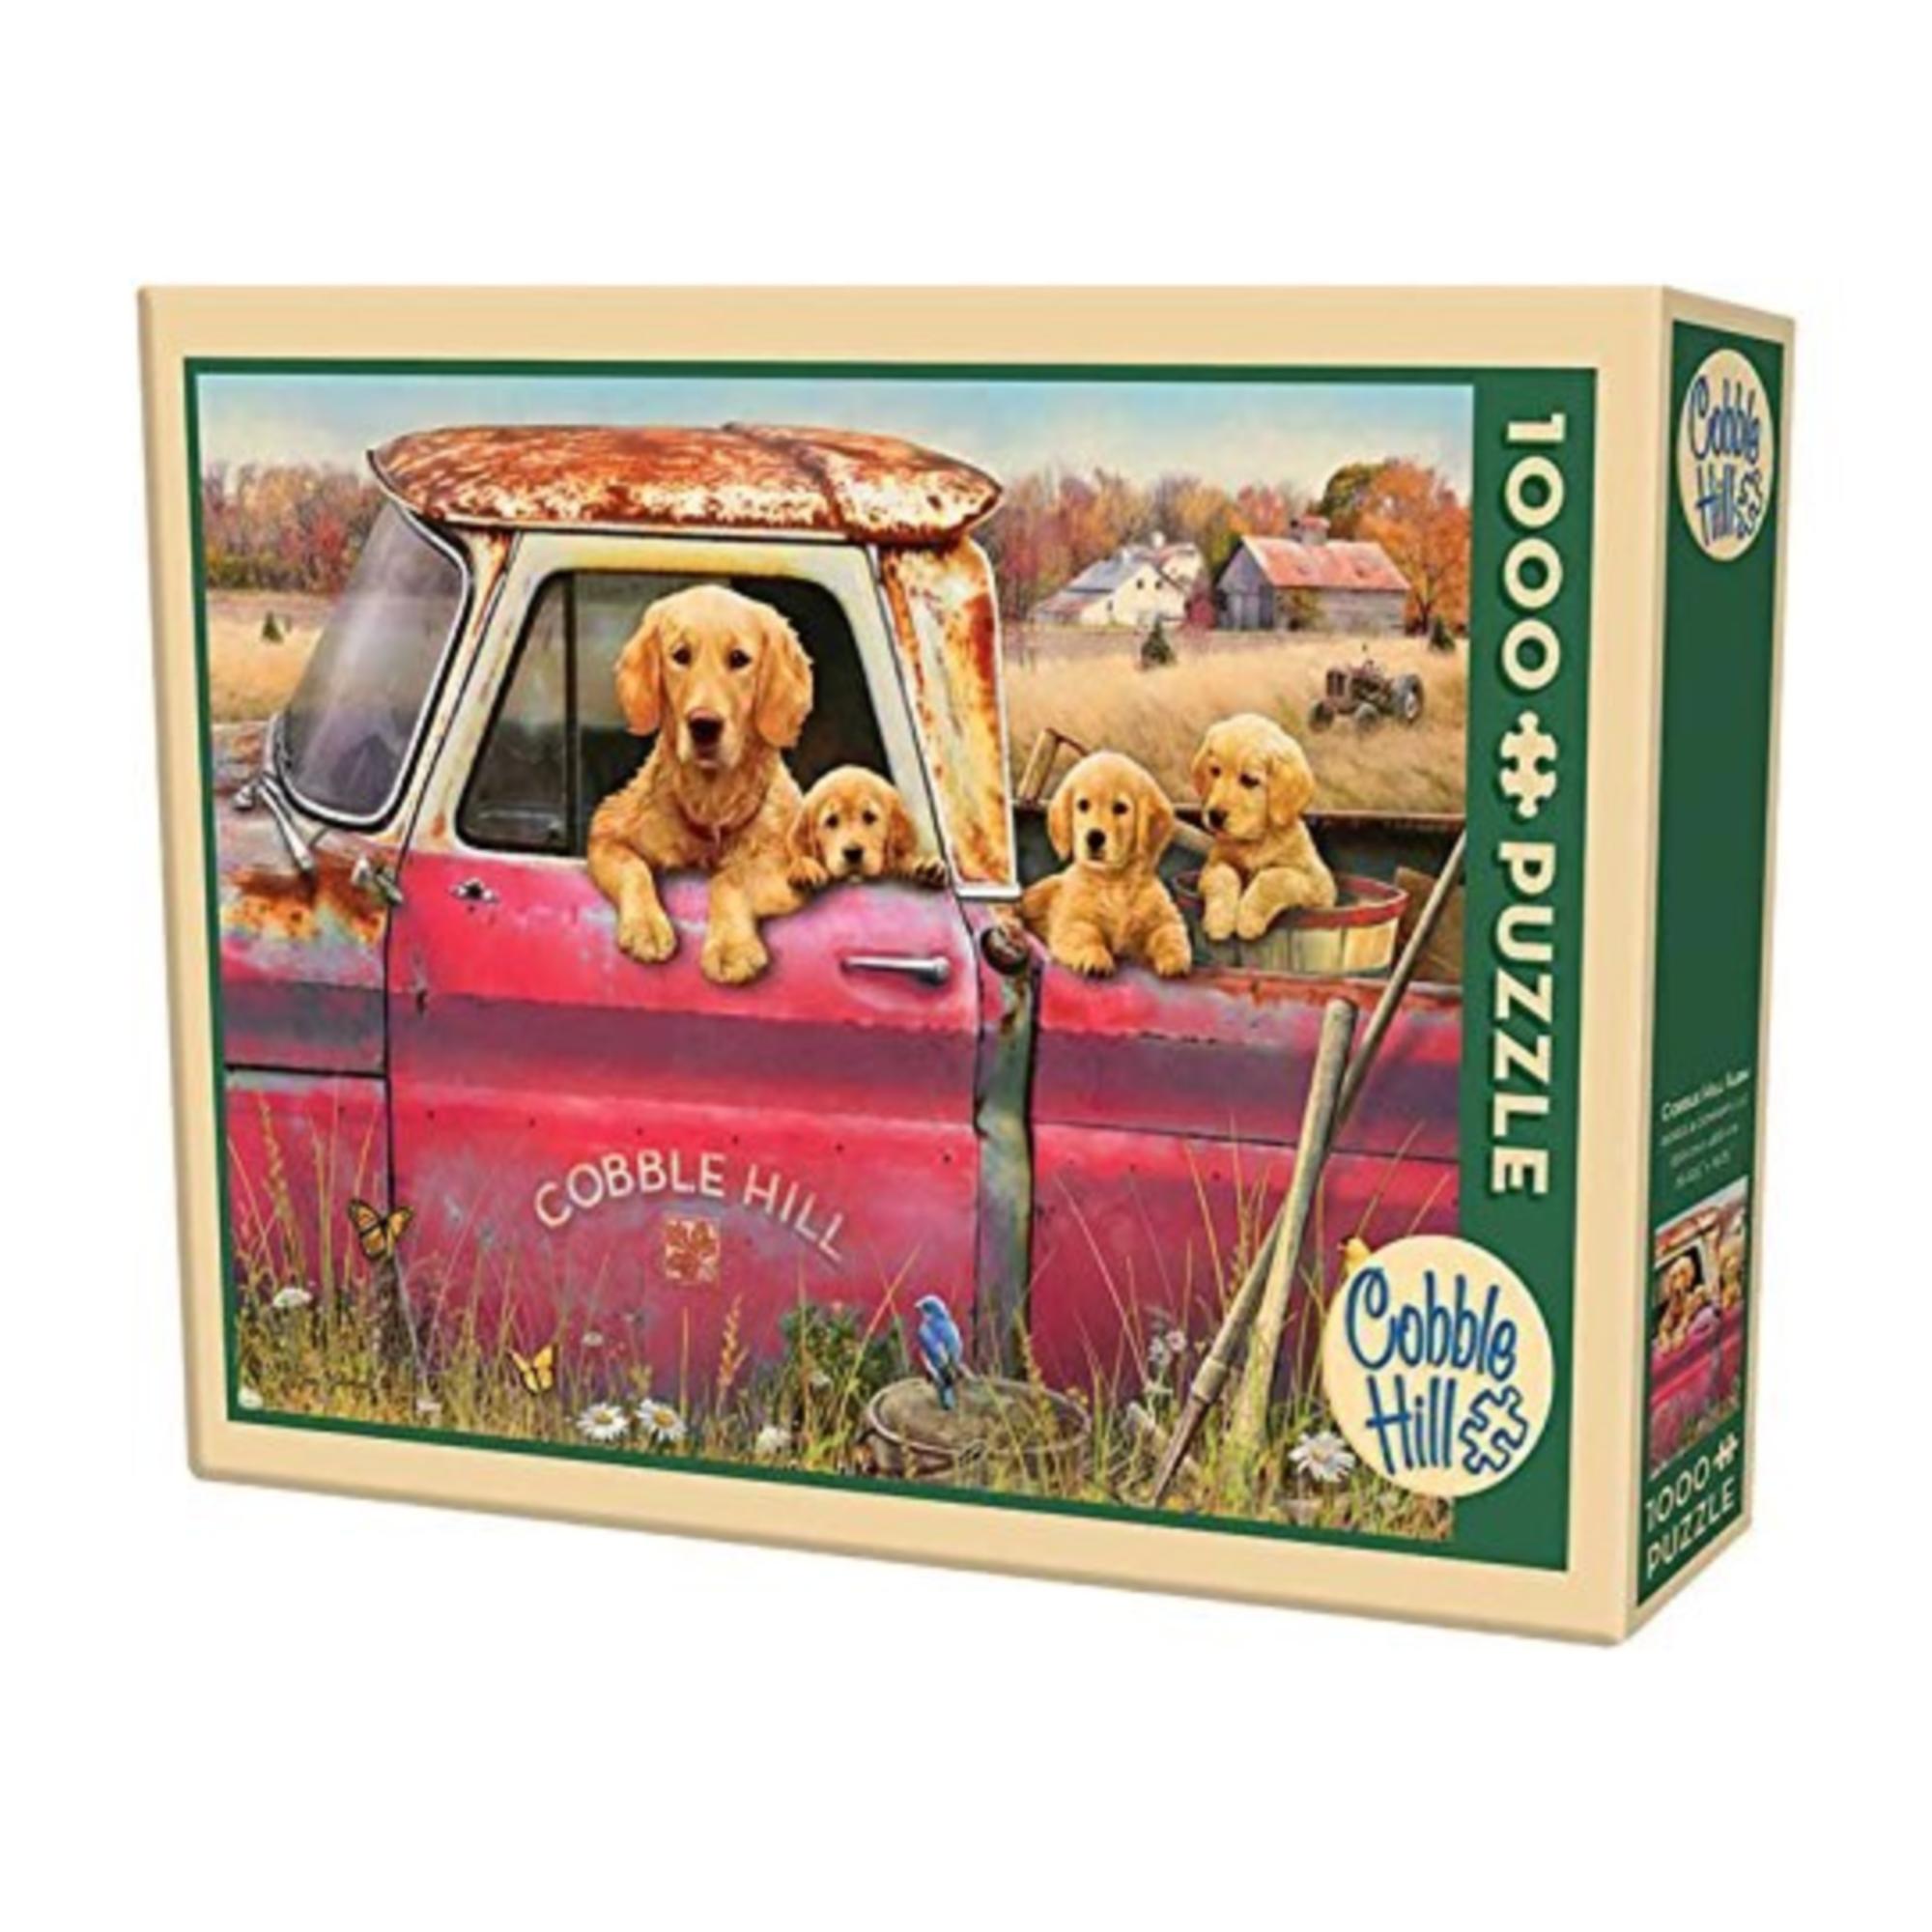 Cobble Hill Puzzle 1000: Cobble Hill Farm